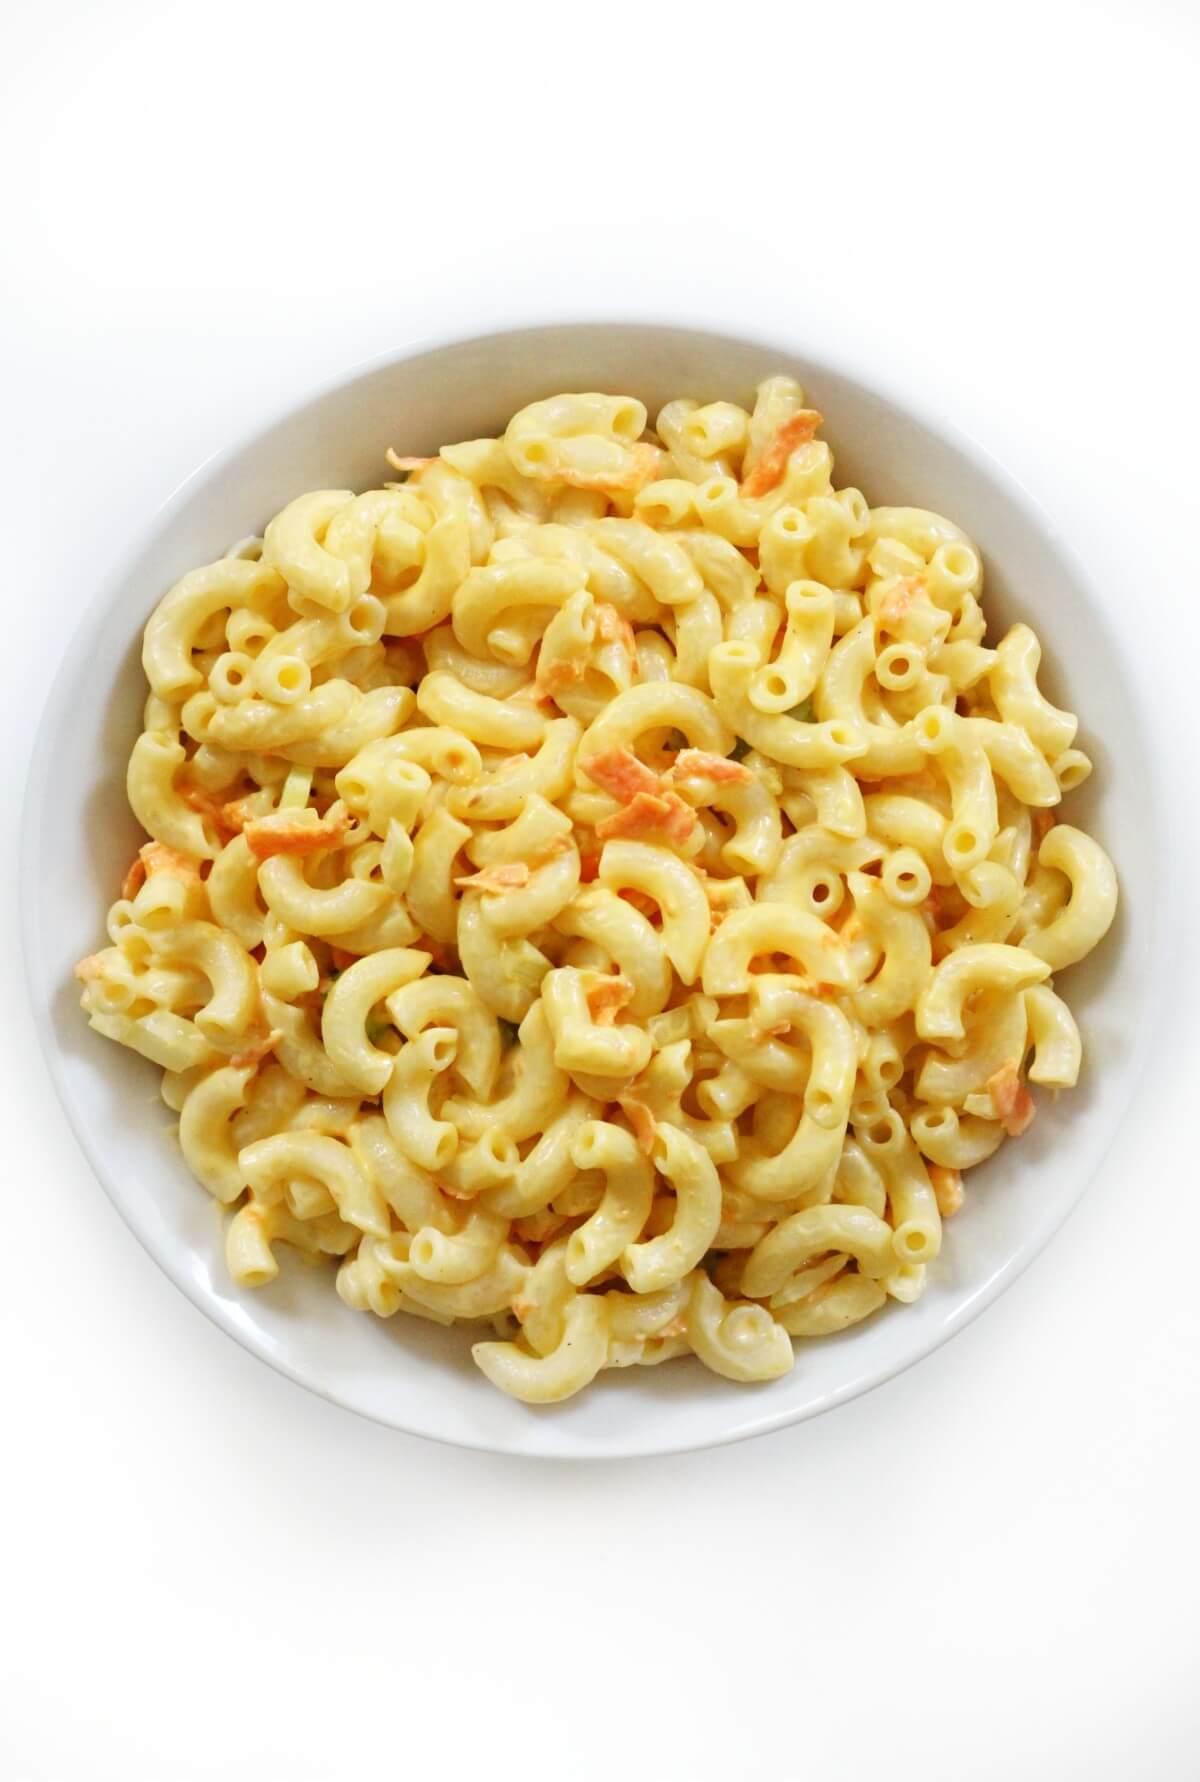 overhead view of gluten-free Hawaiian macaroni salad in white bowl